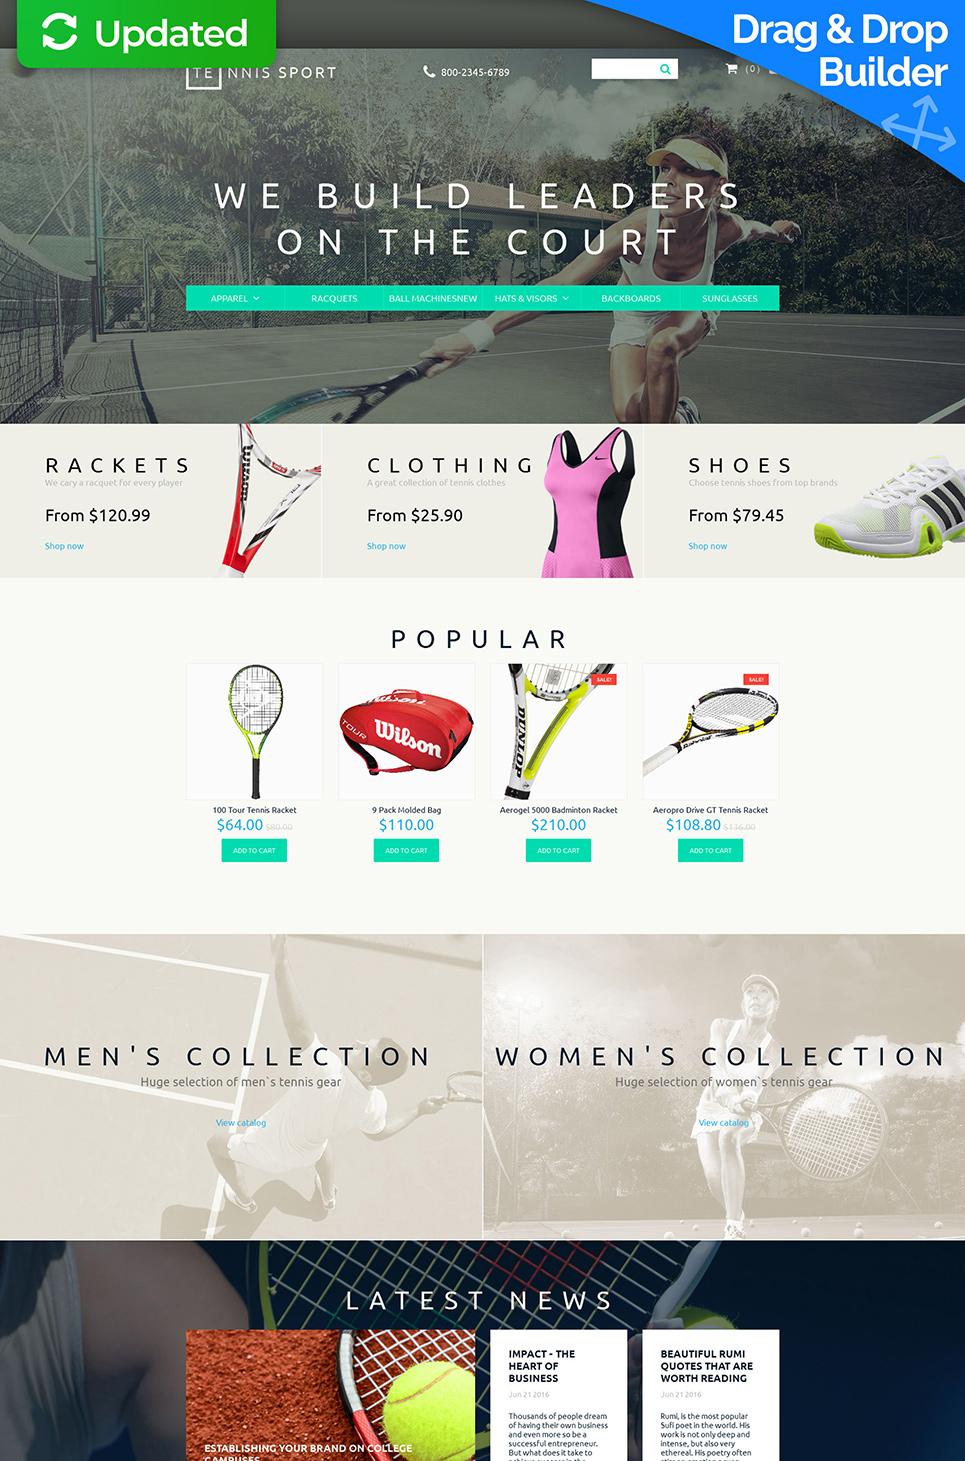 Tennis Sport Ecommerce Website Template - image